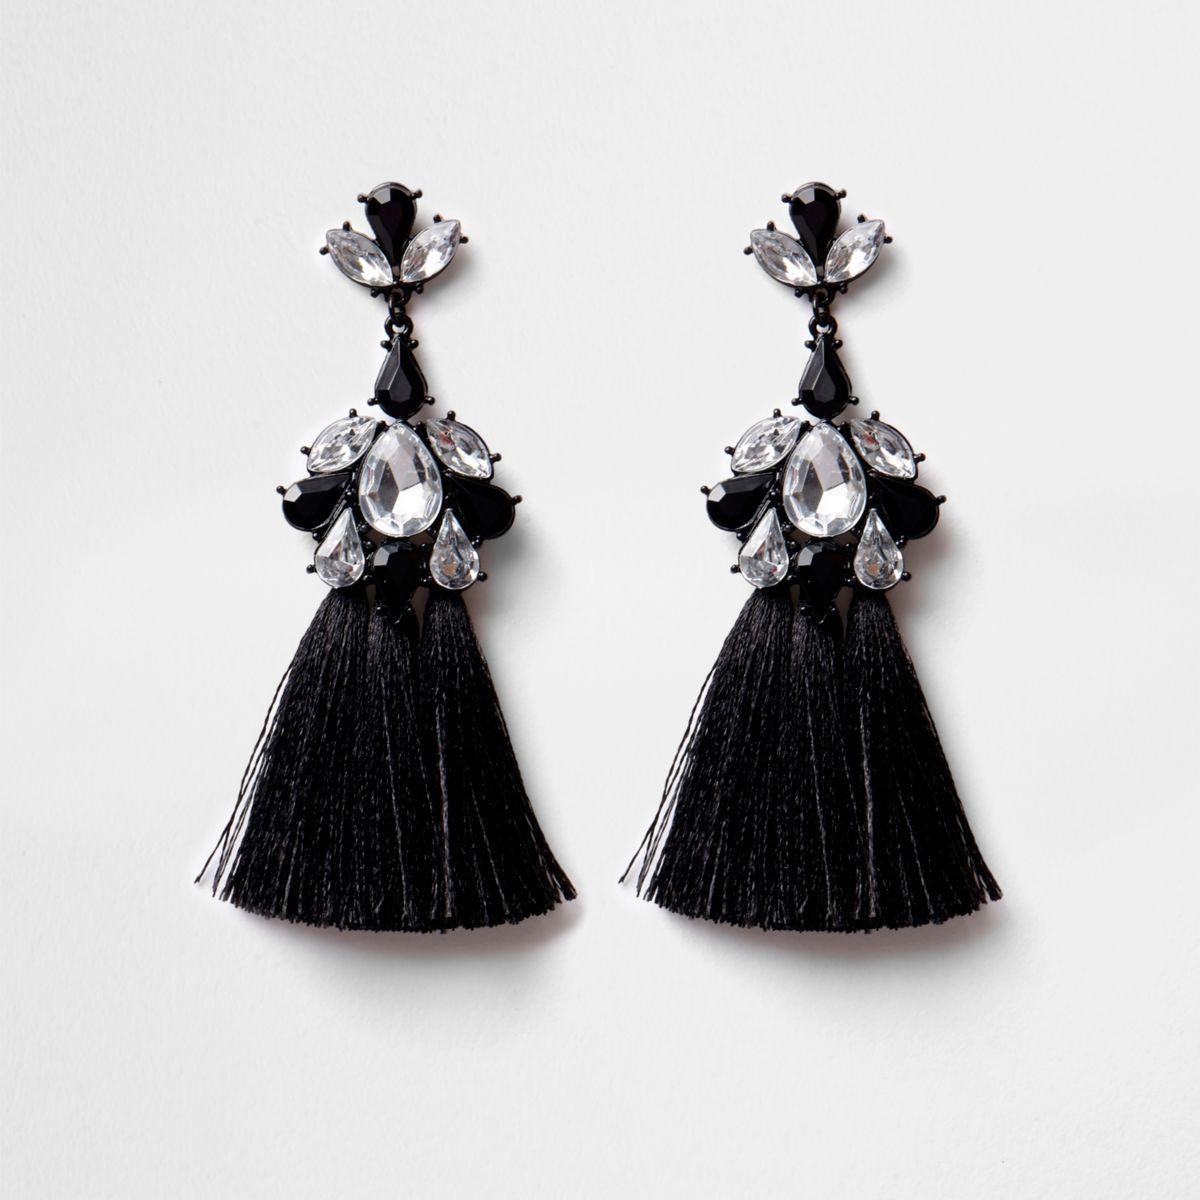 Schwarze Quasten-Ohrringe